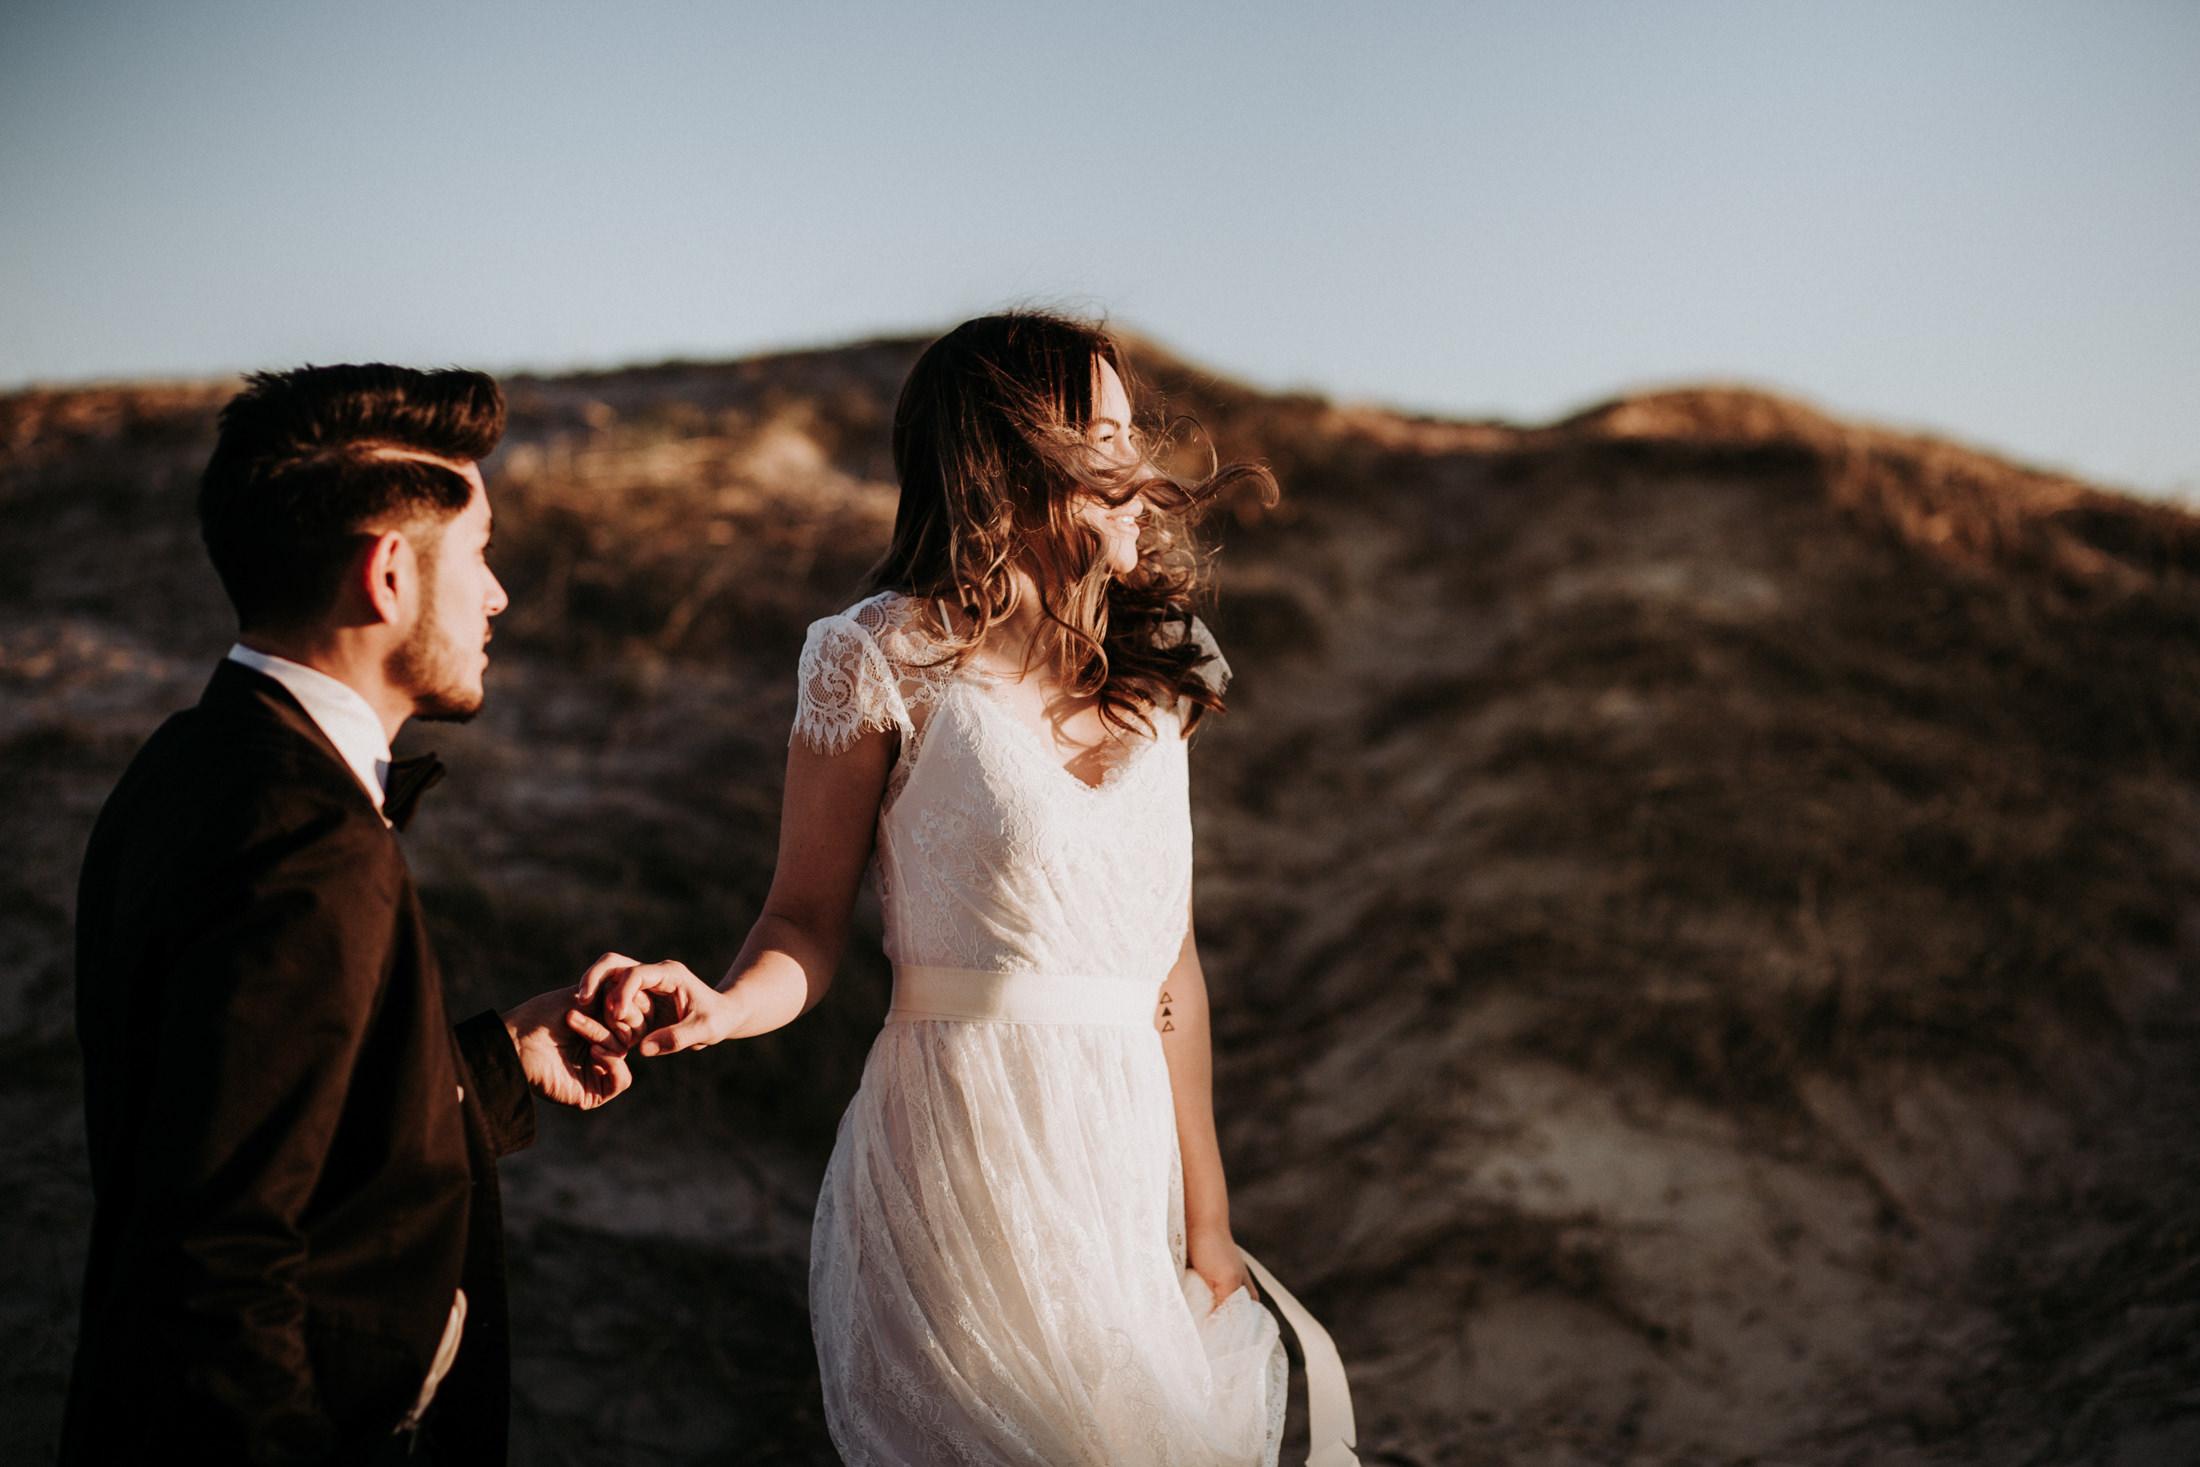 Wedding_Photographer_Mallorca_Daniela-Marquardt_Photography_CanaryIslands_Lanzarote_Iceland_Tuskany_Santorini_Portugal_Schweiz_Austria_Bayern_Elopement_Hochzeitsfotograf_Norddeichich_44